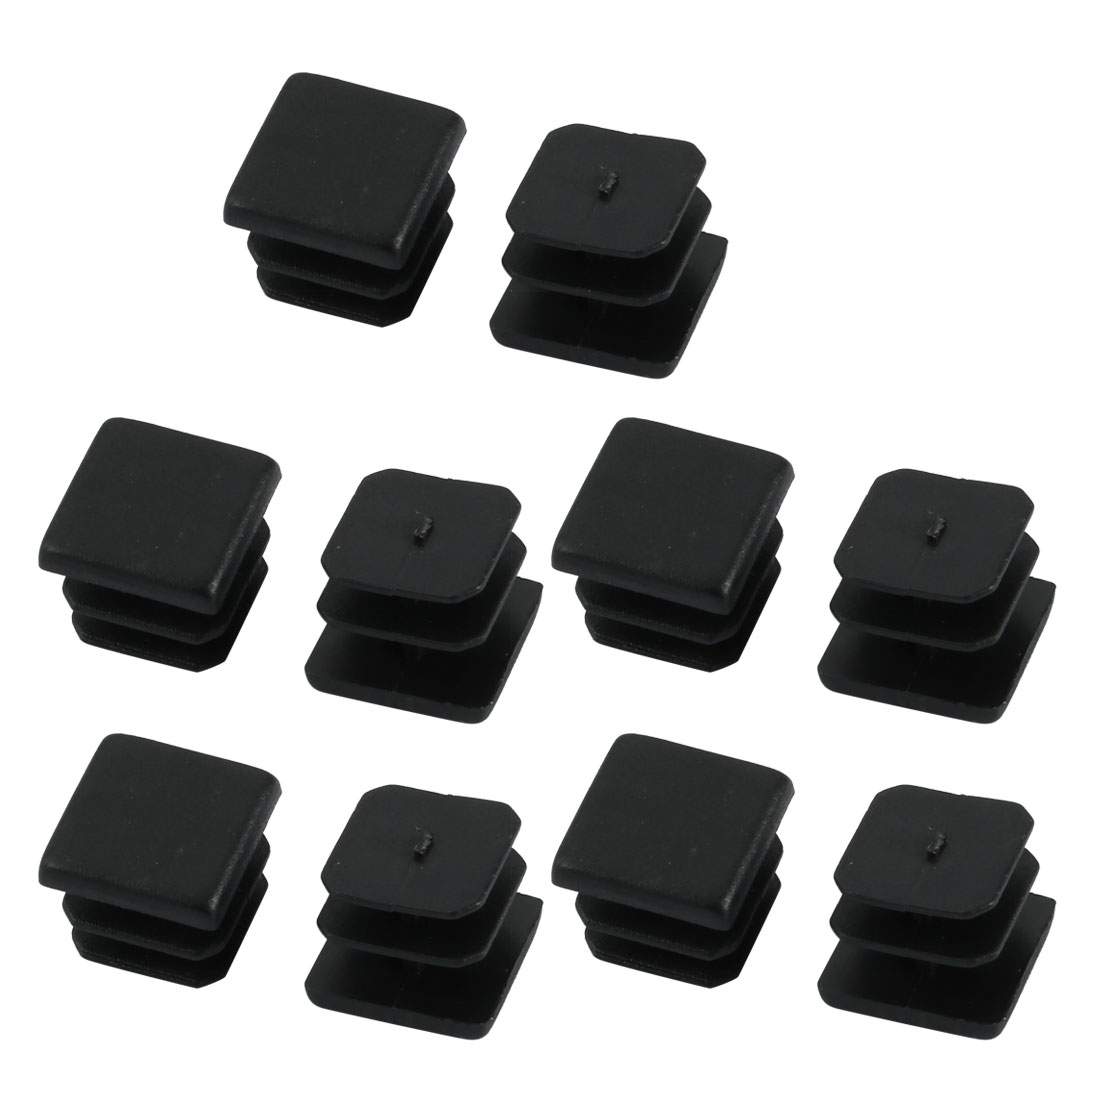 10pcs Furniture Legs Protector Plastic Square Tube Inserts Cap Black 13mm x 13mm